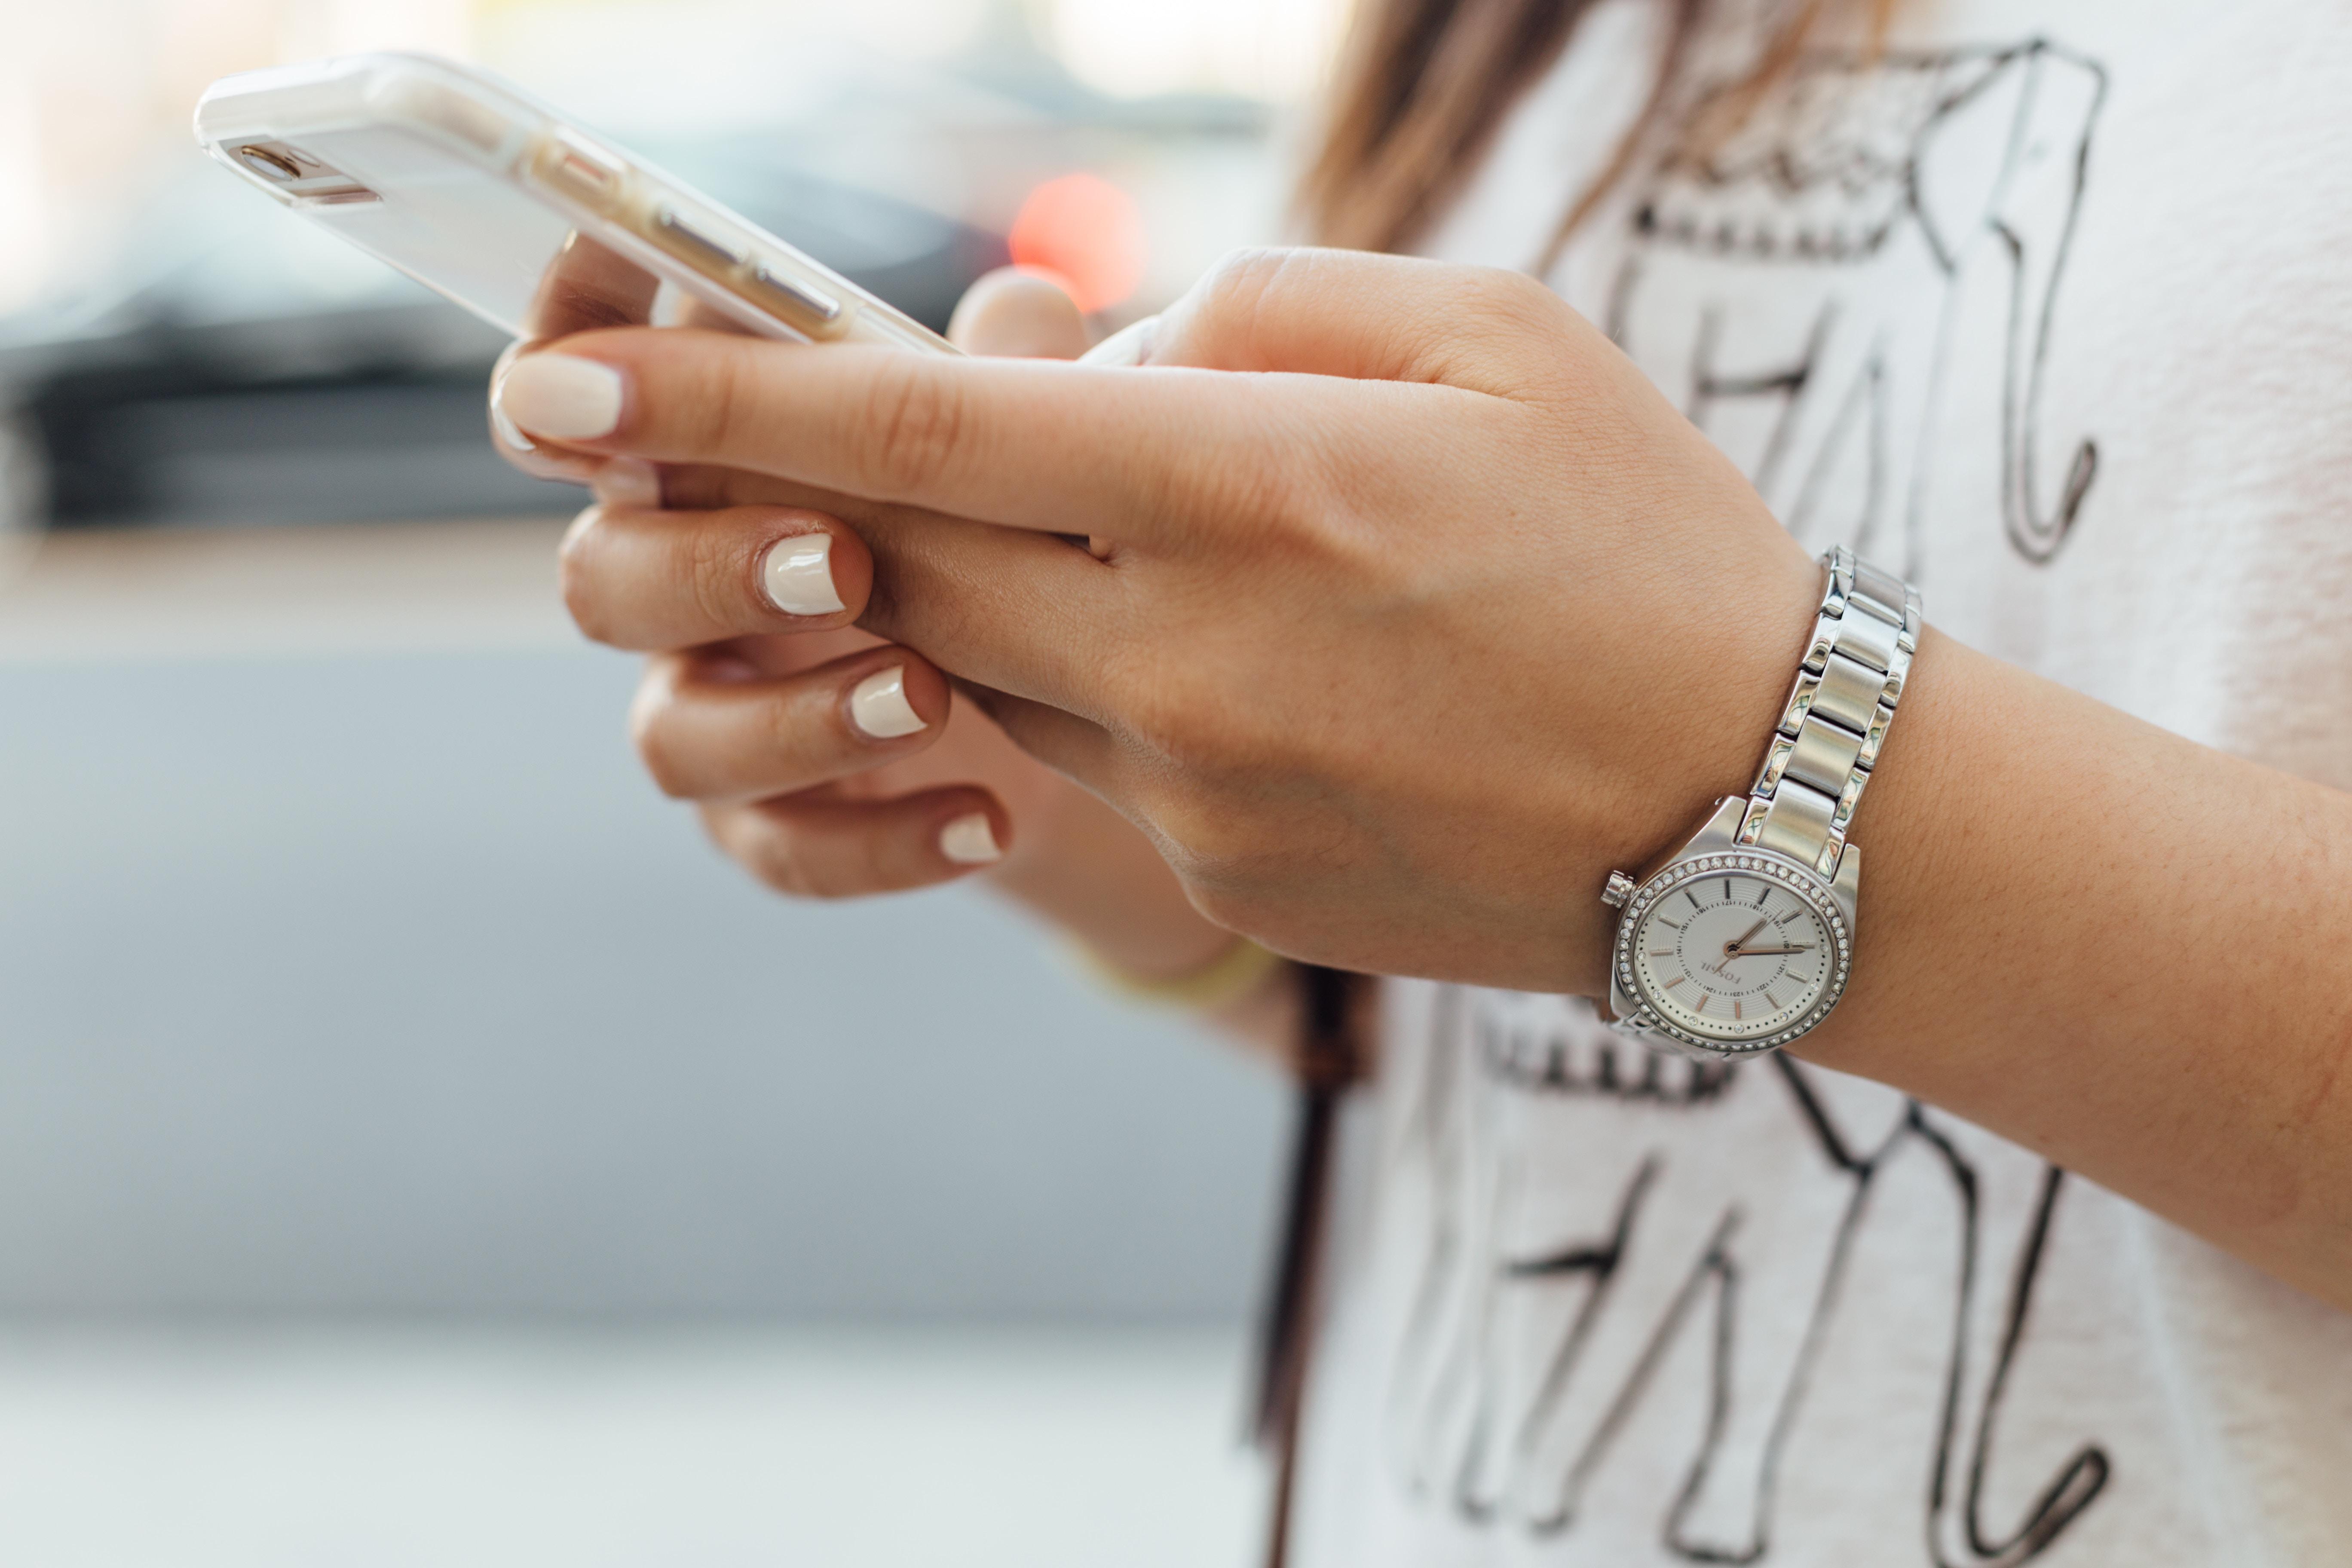 WLAN Smartphone